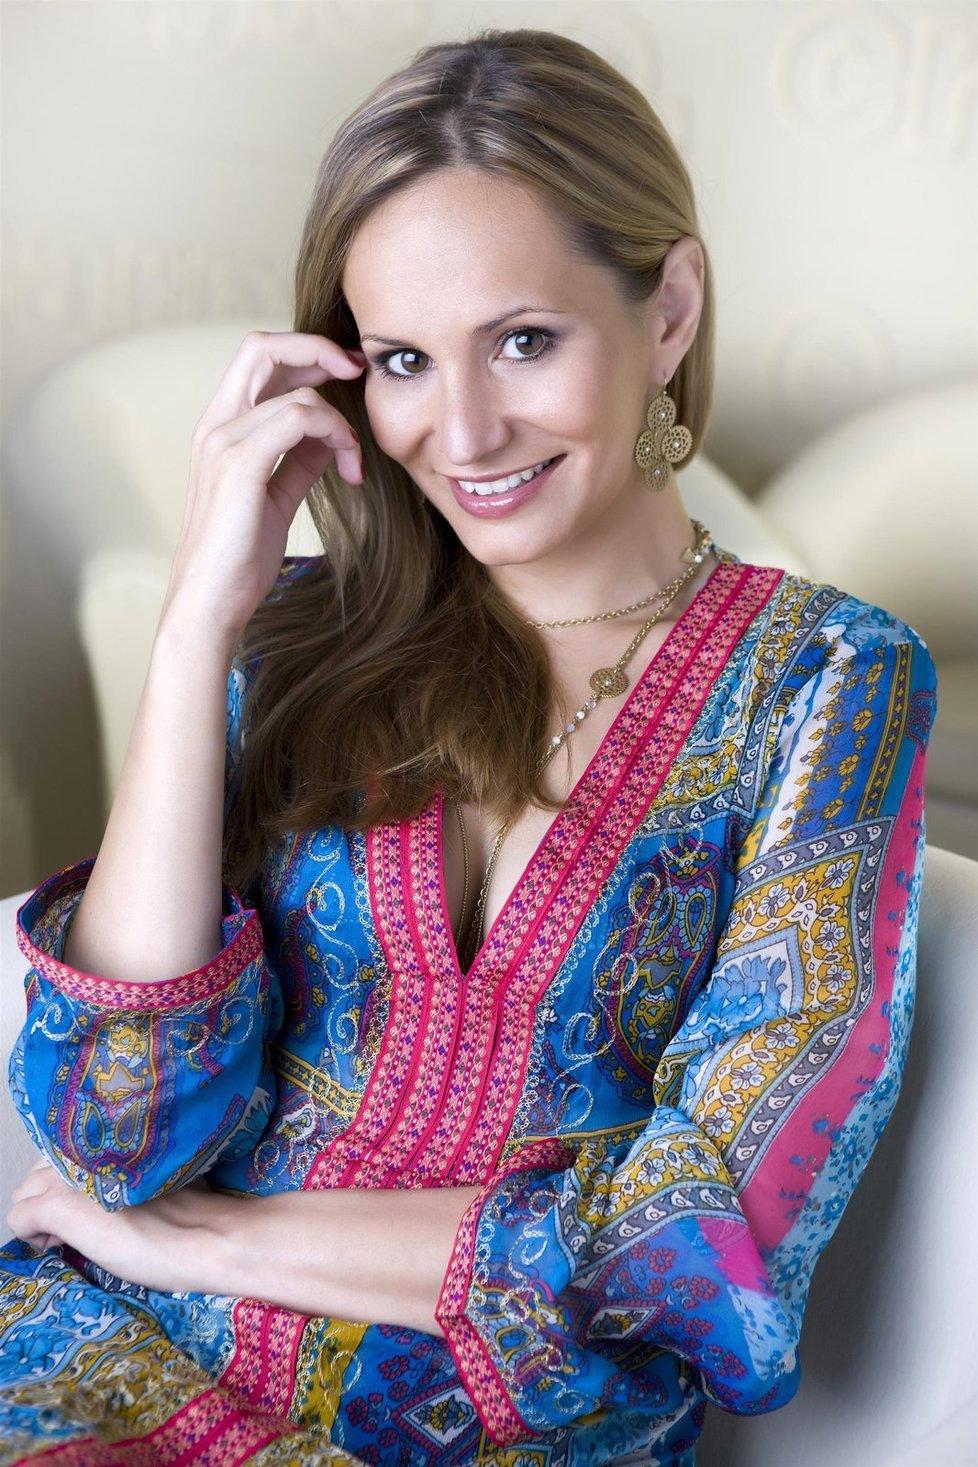 Forum on this topic: Margaret Johnston, monika-absolonova/